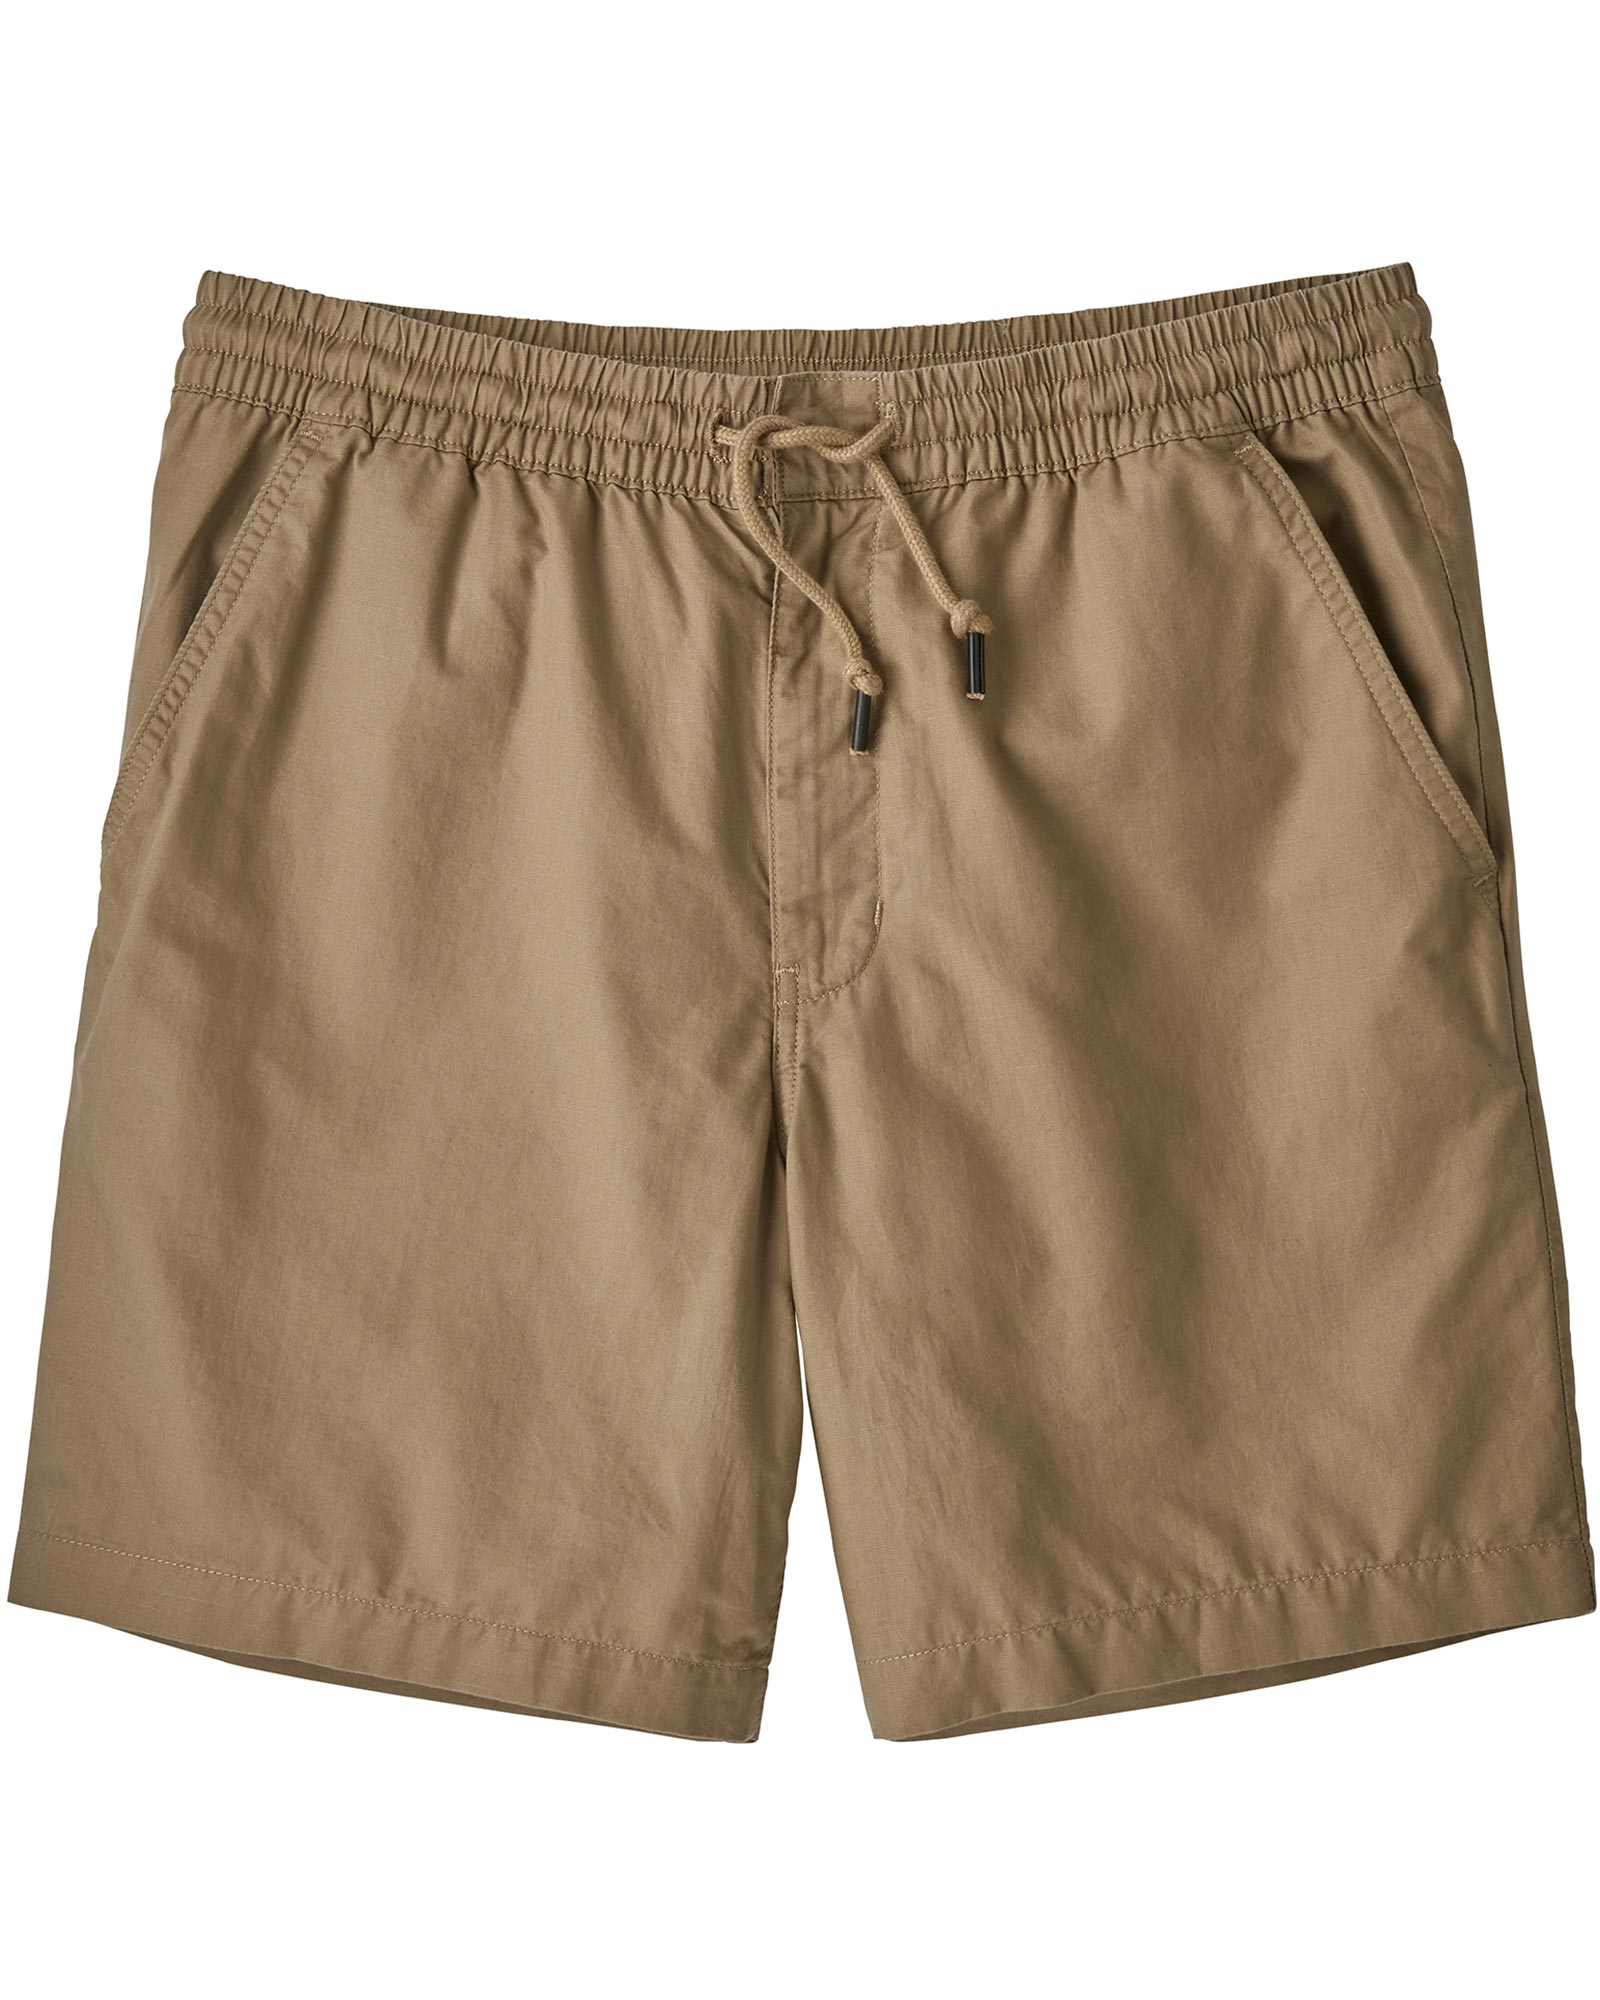 Product image of Patagonia Men's Hemp All Wear Hemp Volley Shorts